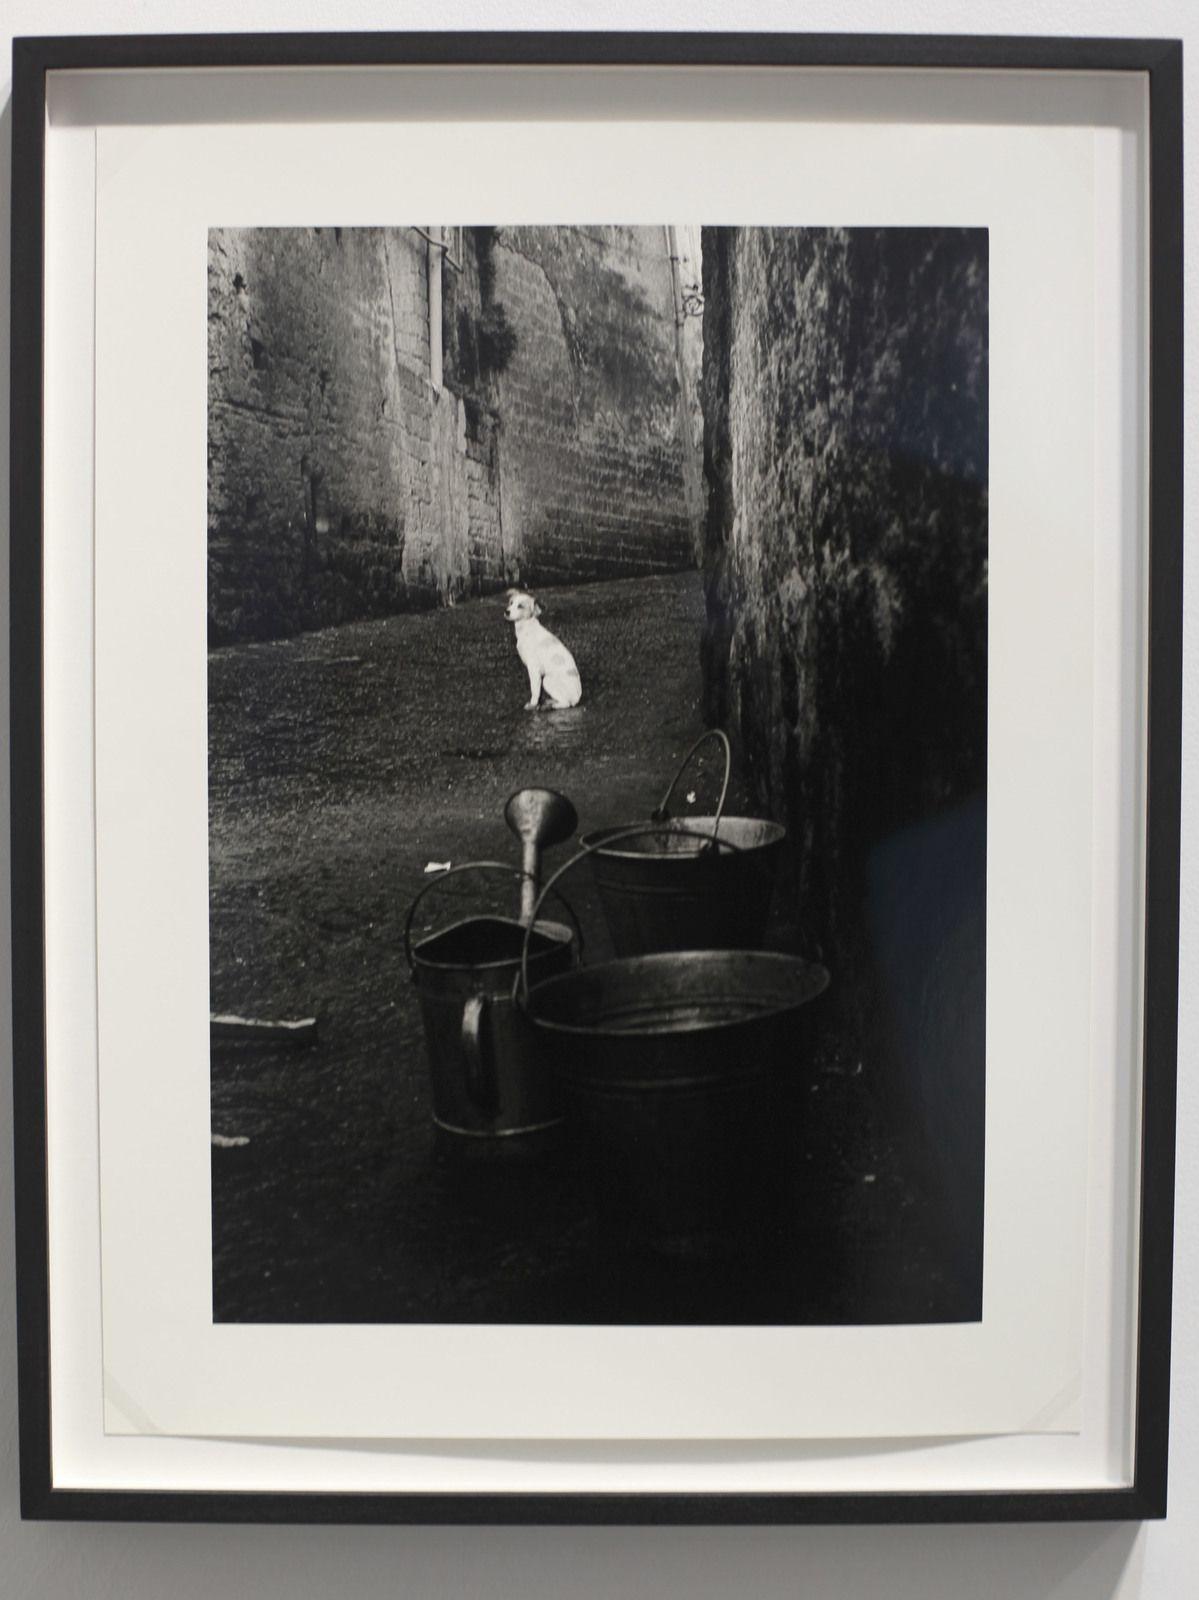 """Alley Dog, Naples, Italy"", 1961 de Herbert LIST - Courtesy de la galerie Galerie Karsten Greve Paris © Phorto Éric Simon"